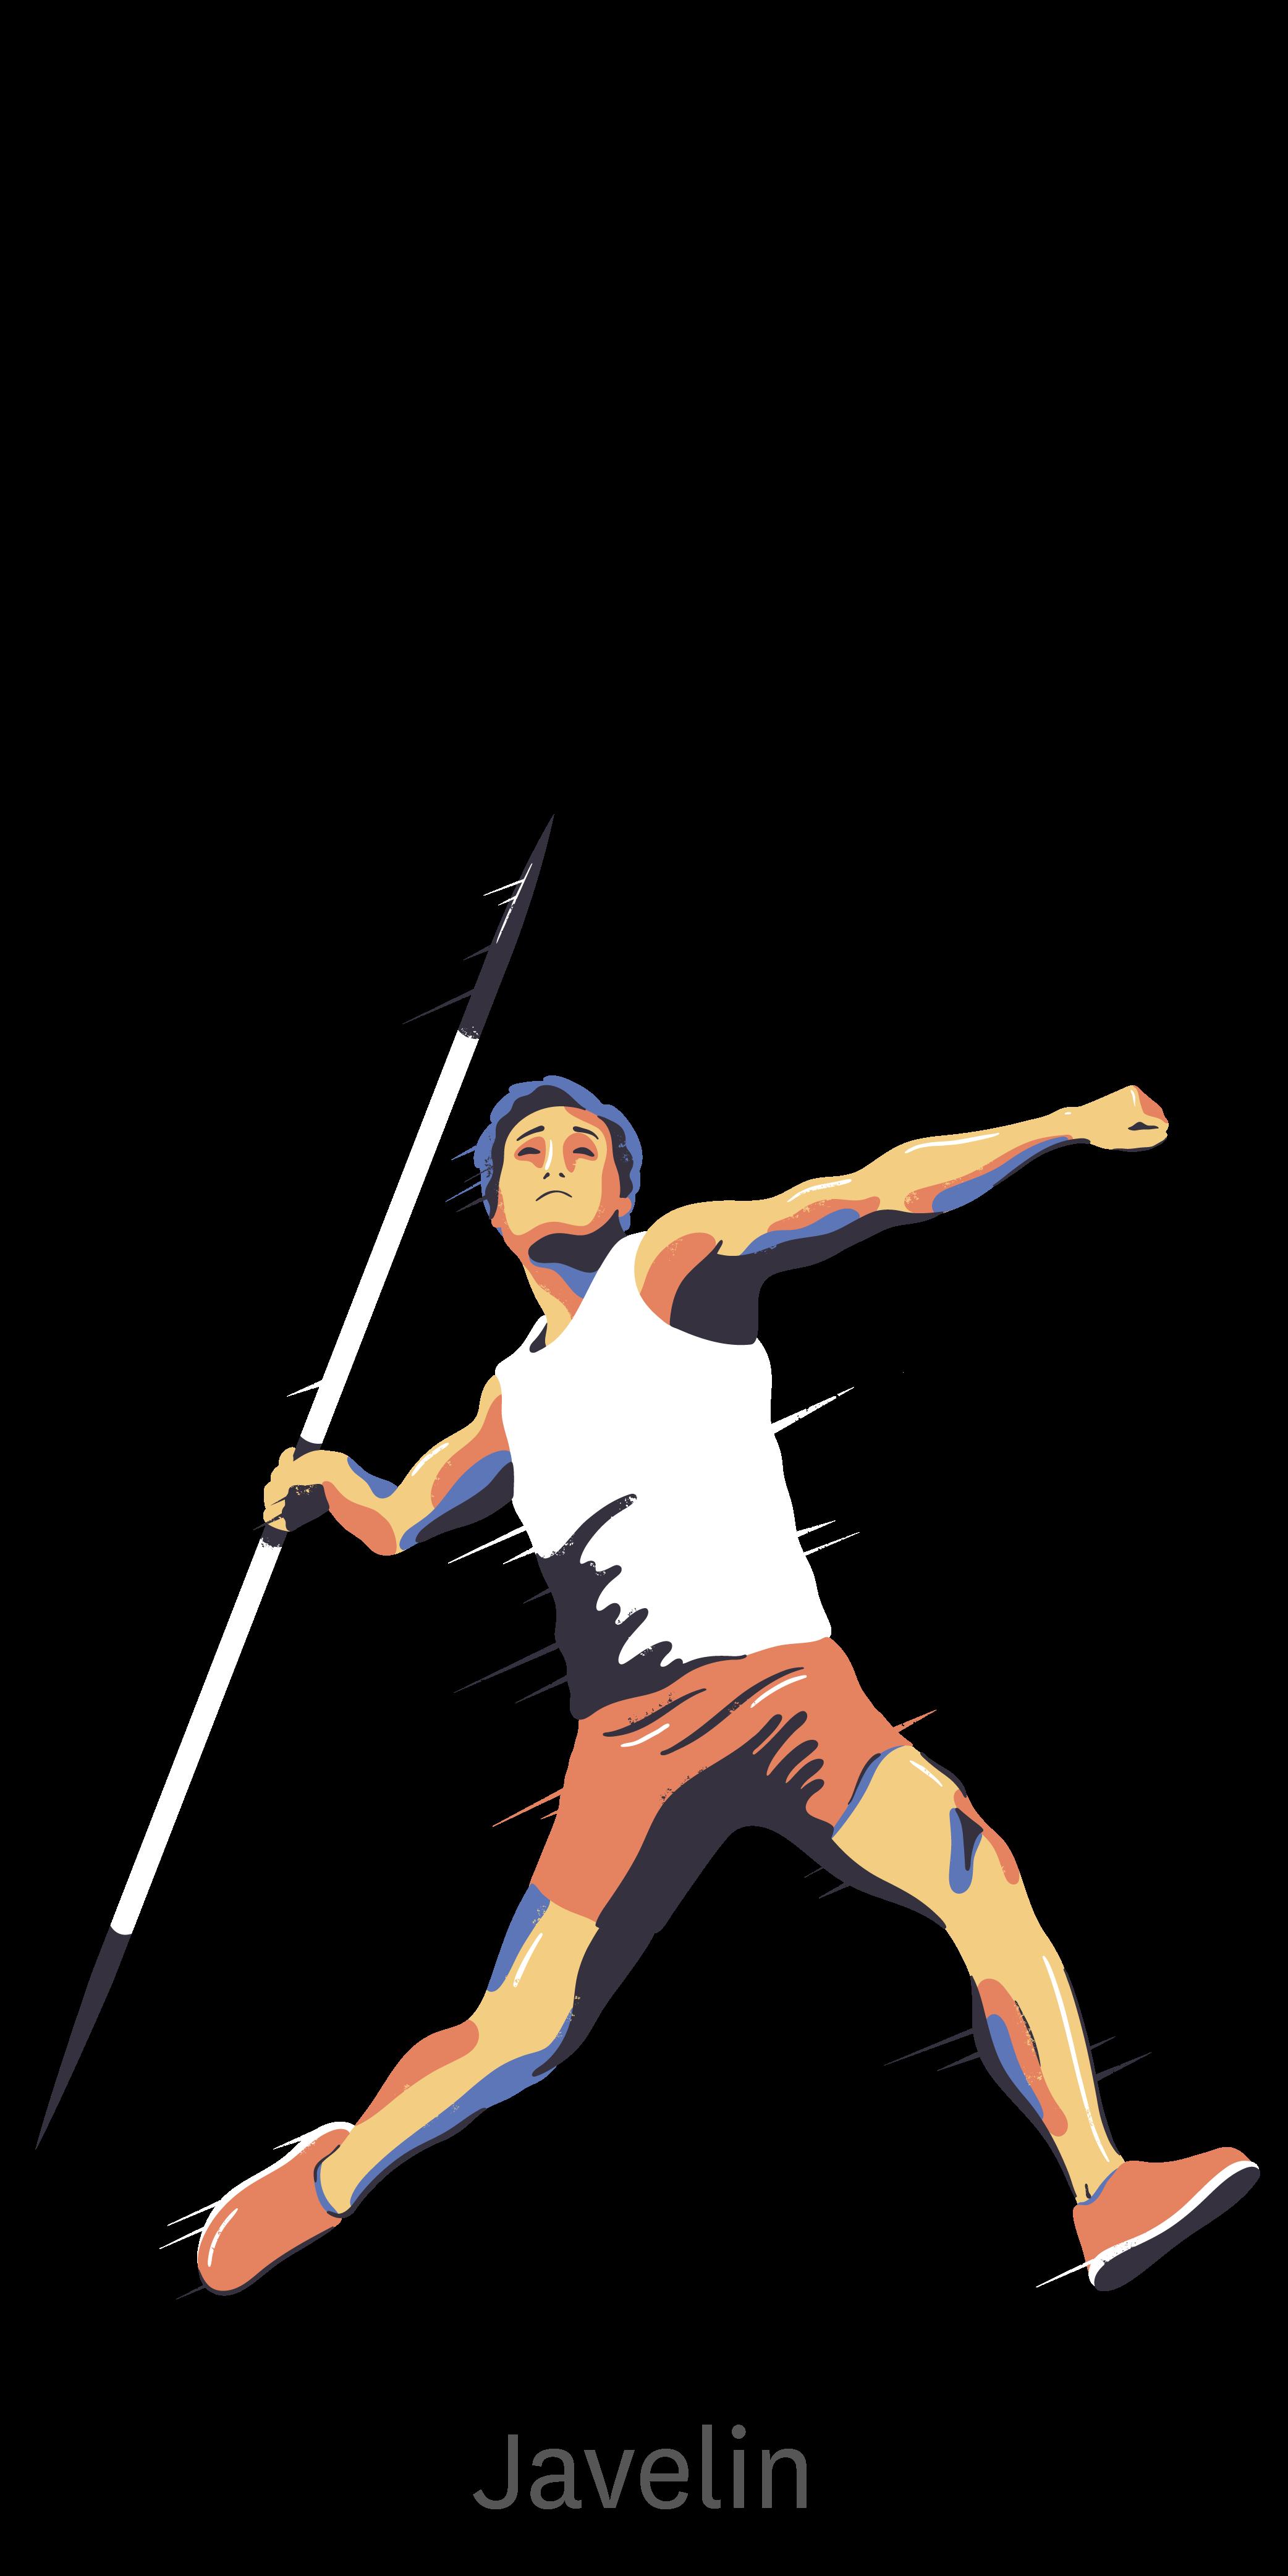 movement_sport_javelin.png